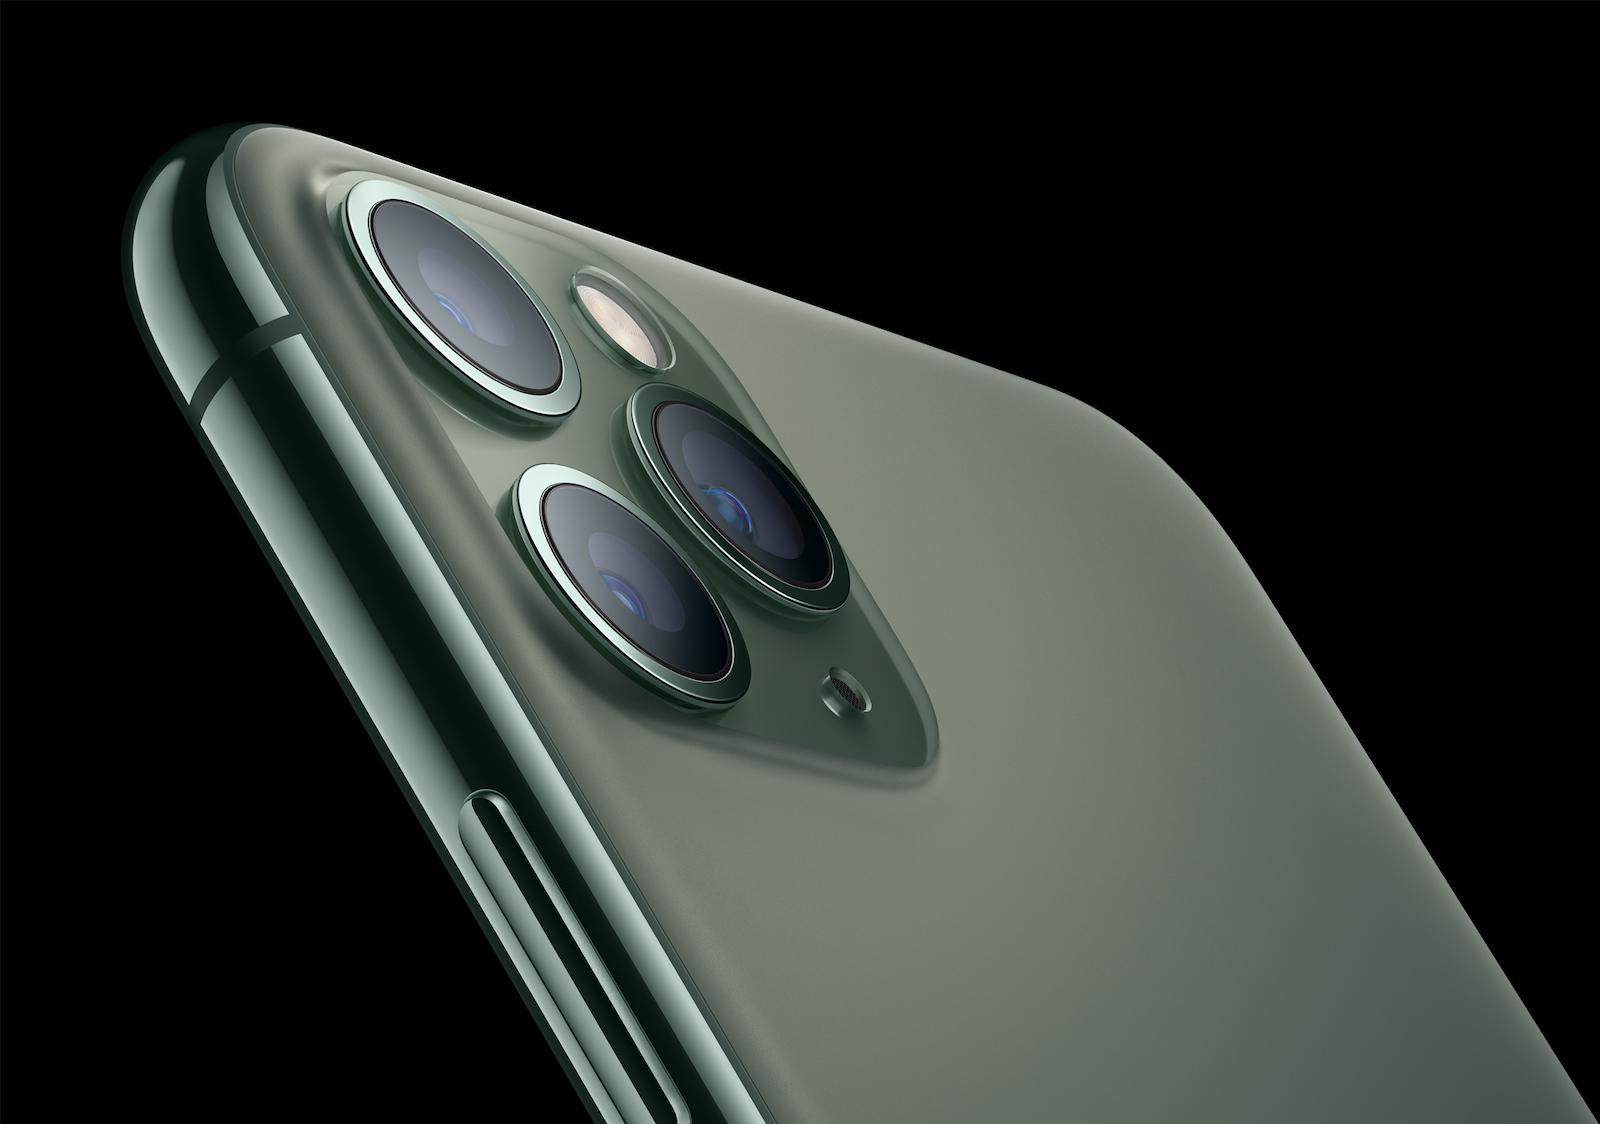 Apple_iPhone-11-Pro_Matte-Glass-Back_091019.jpg